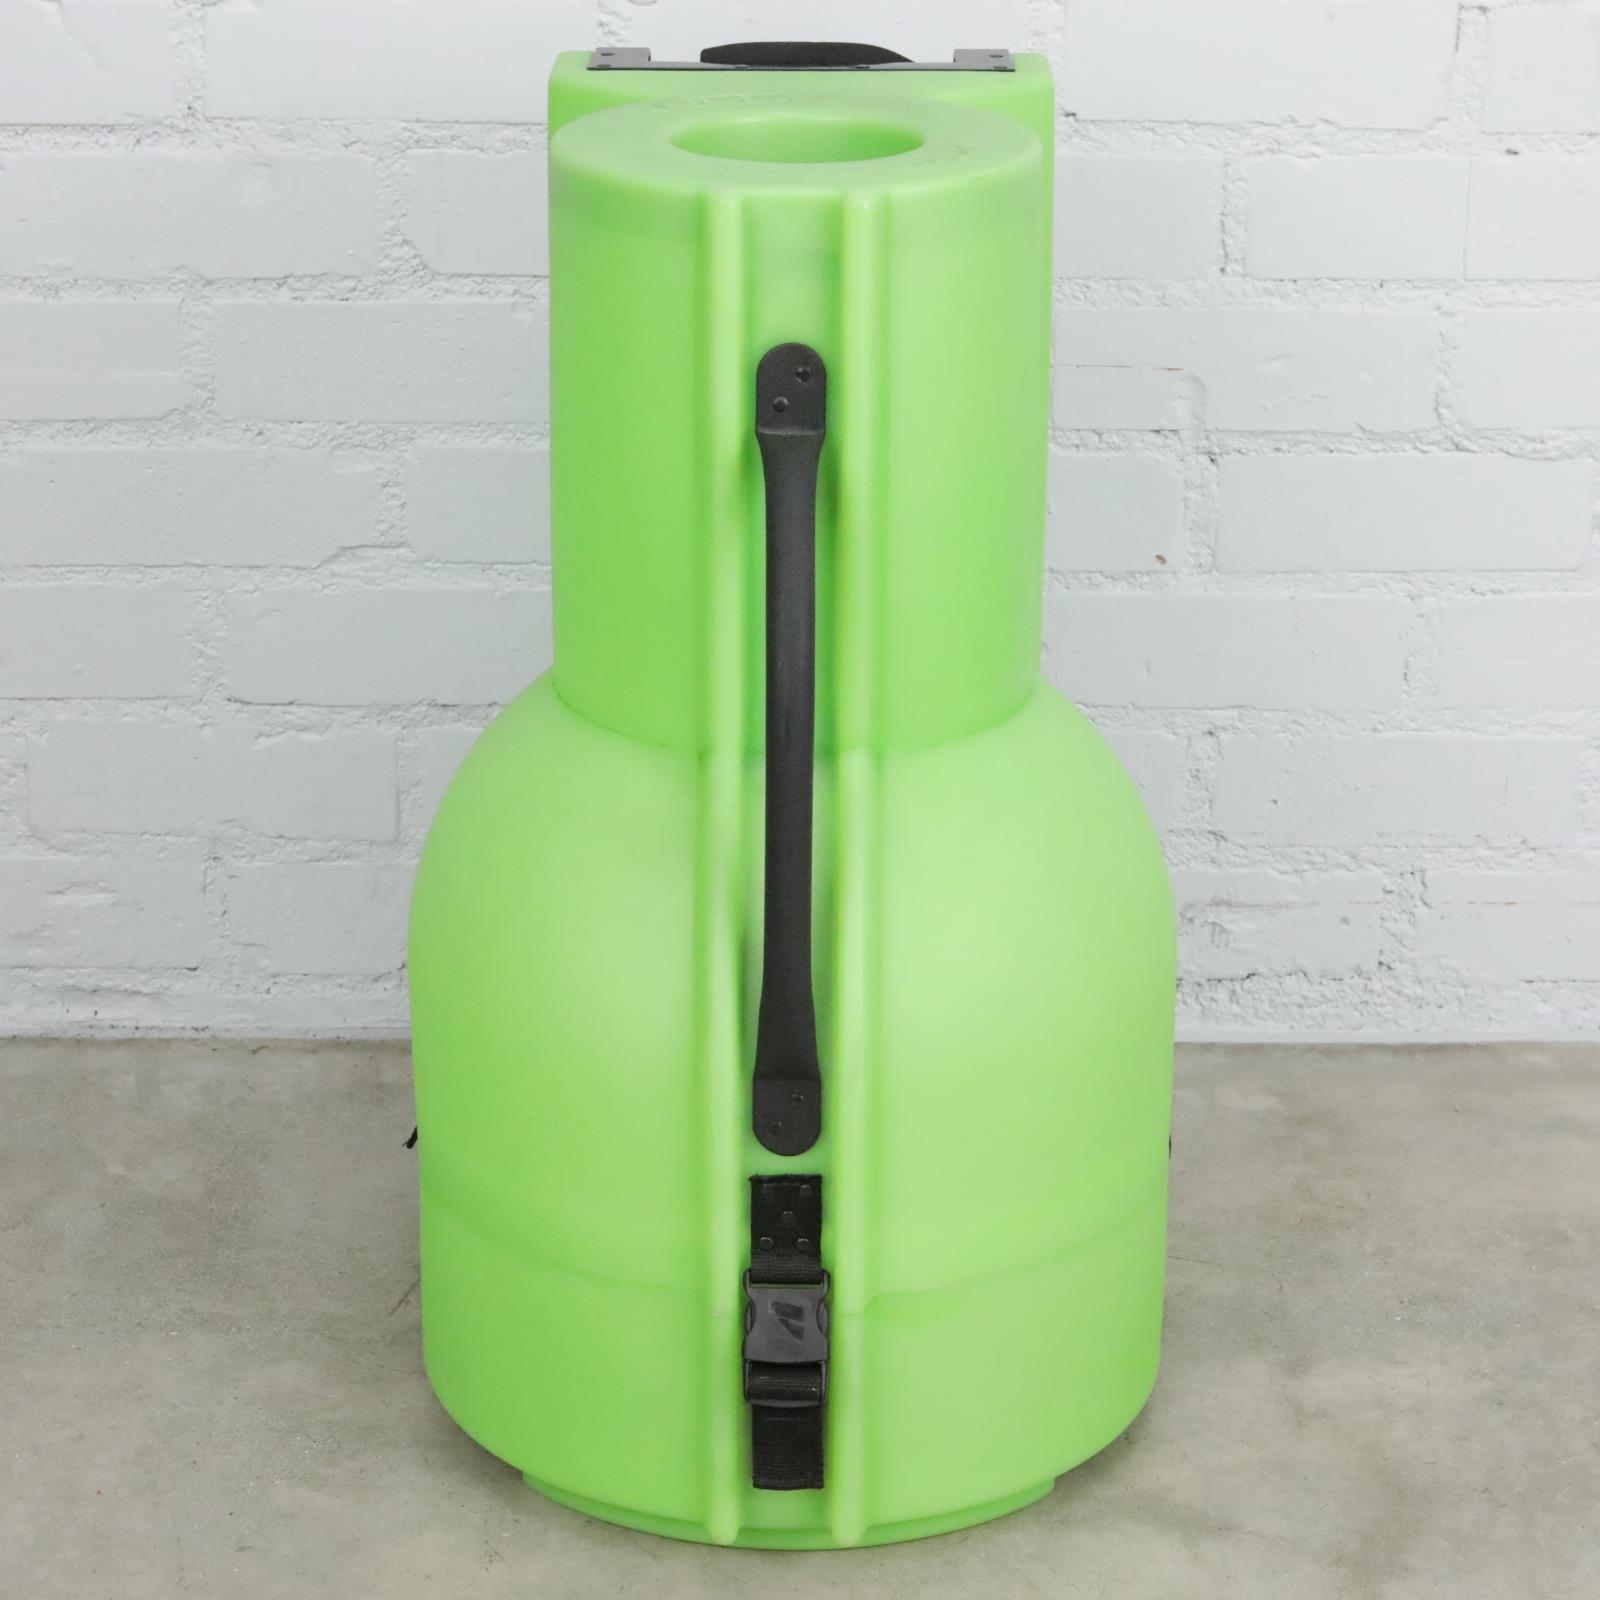 "Humes & Berg Enduro Pro 14"" Djembe Tilt-N-Pull Hard Shell Case Lime Green #41039"